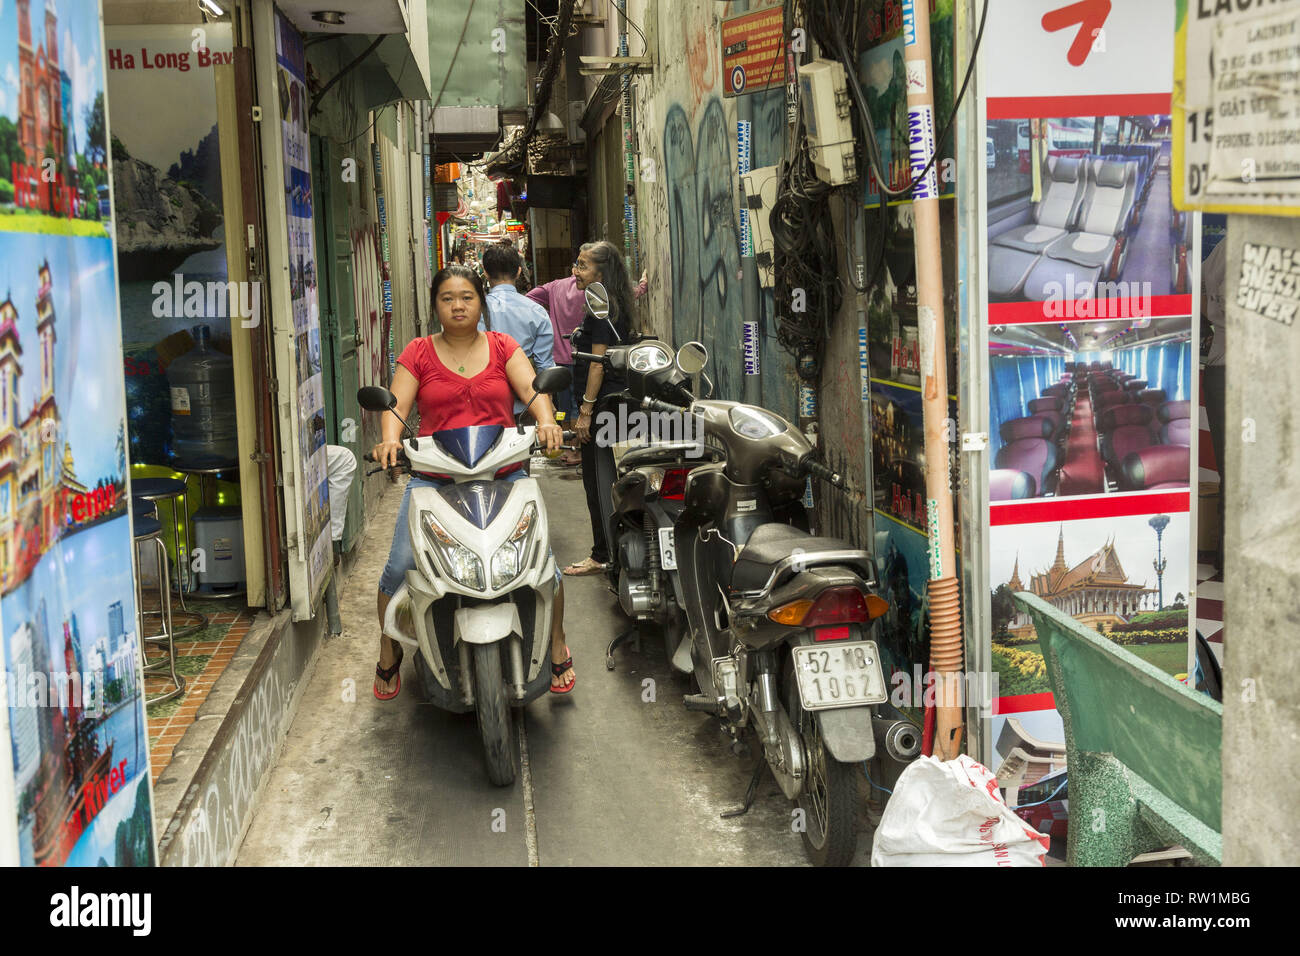 Asia Hostel Stock Photos Asia Hostel Stock Images Alamy